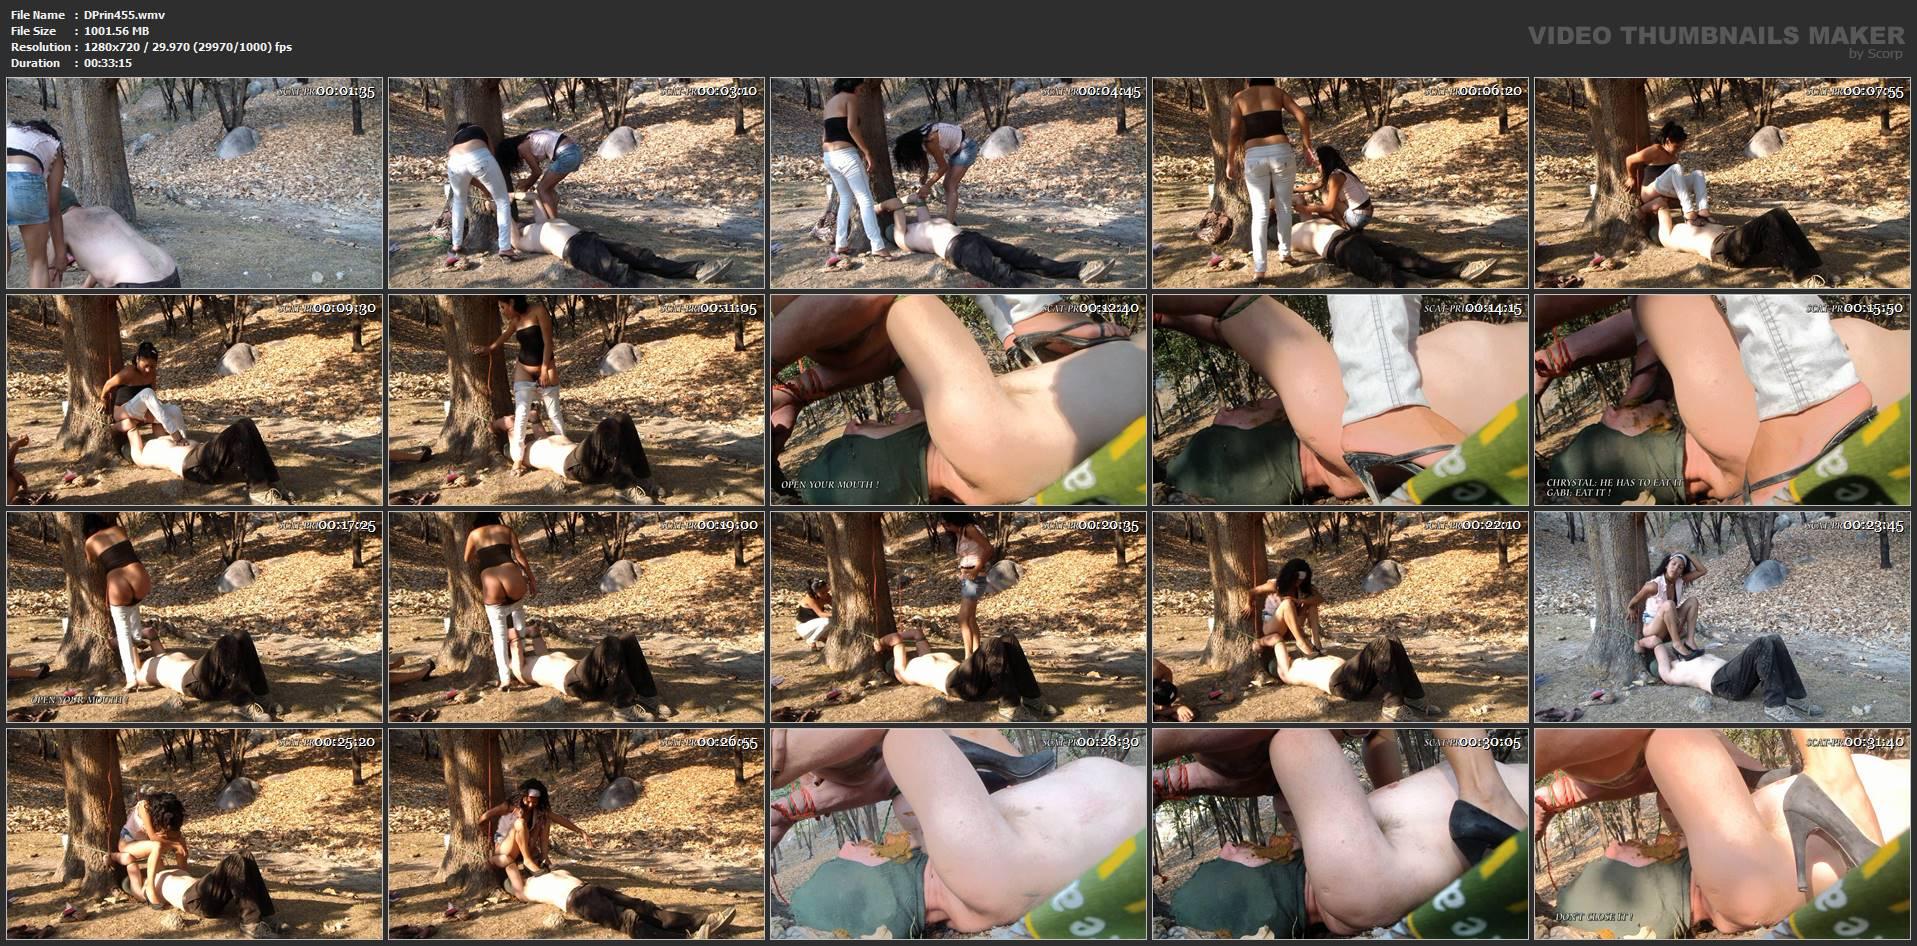 [DOM-PRINCESS] Toiletman takes Toiletshape Subt [HD][720p][WMV]